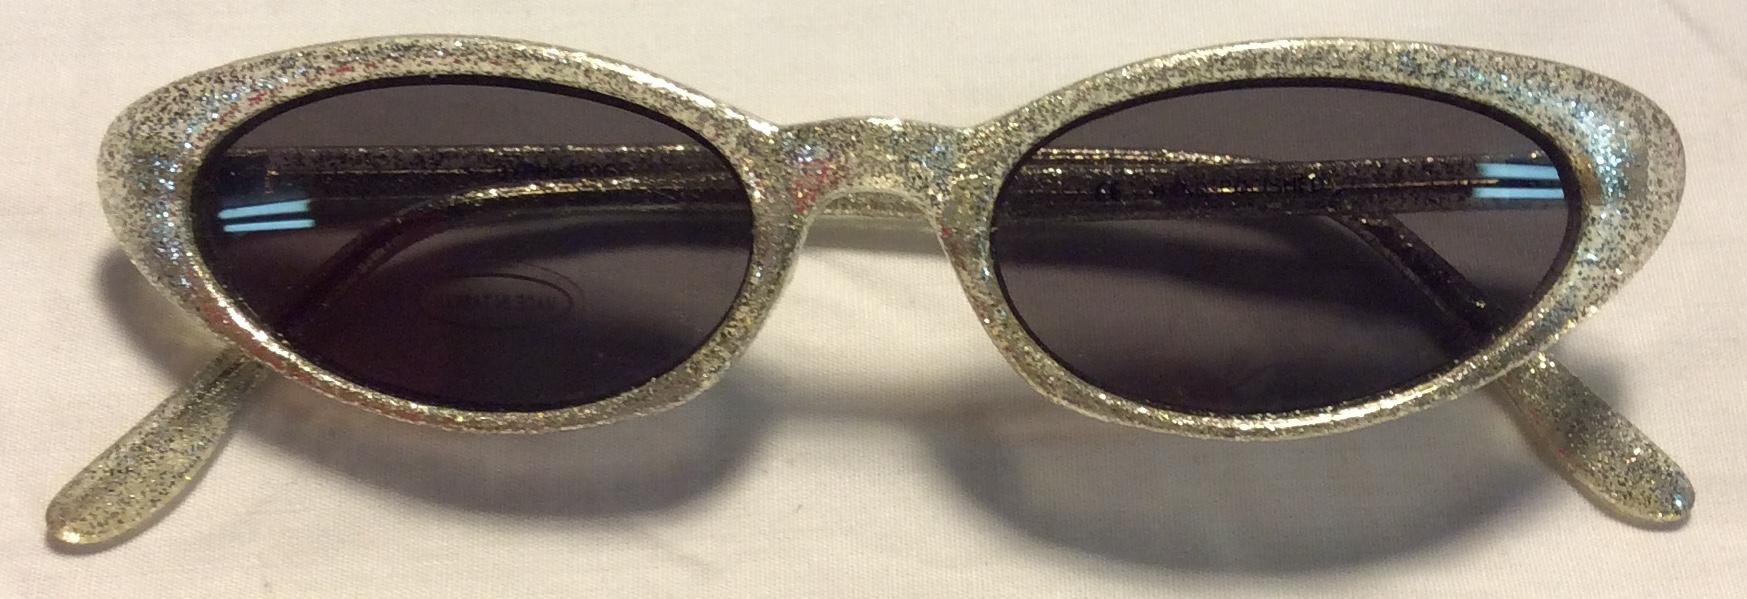 Thin silver glitter plastic frames